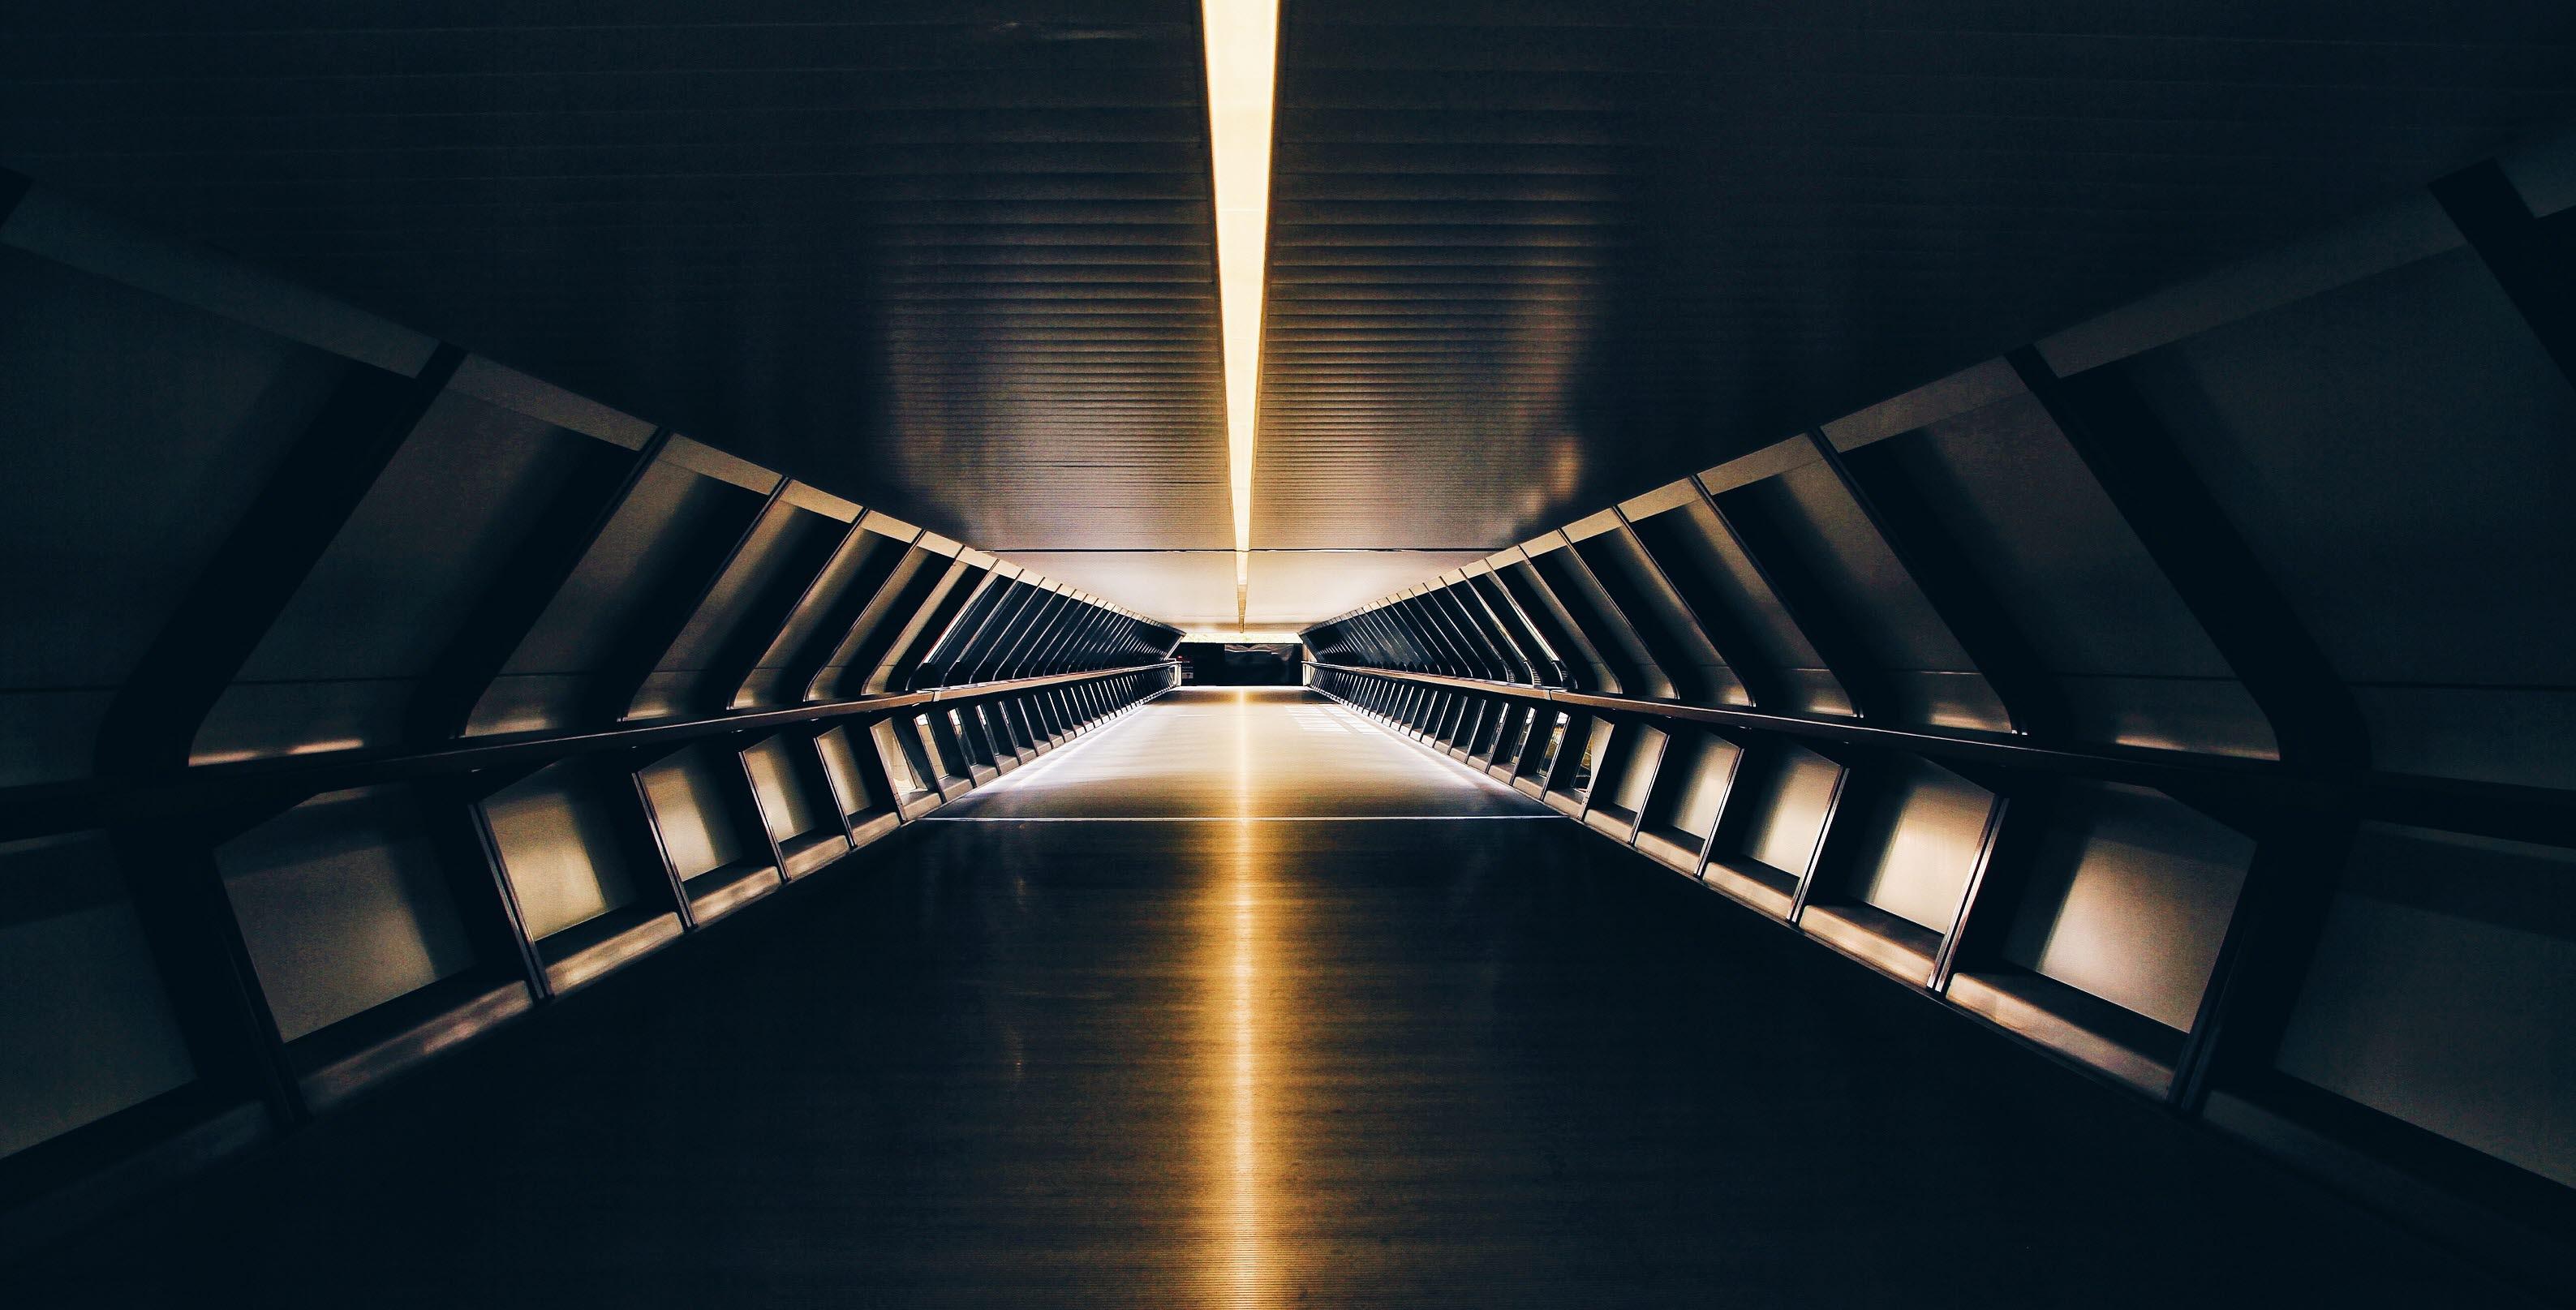 Tunnel, Light, 140818, mb